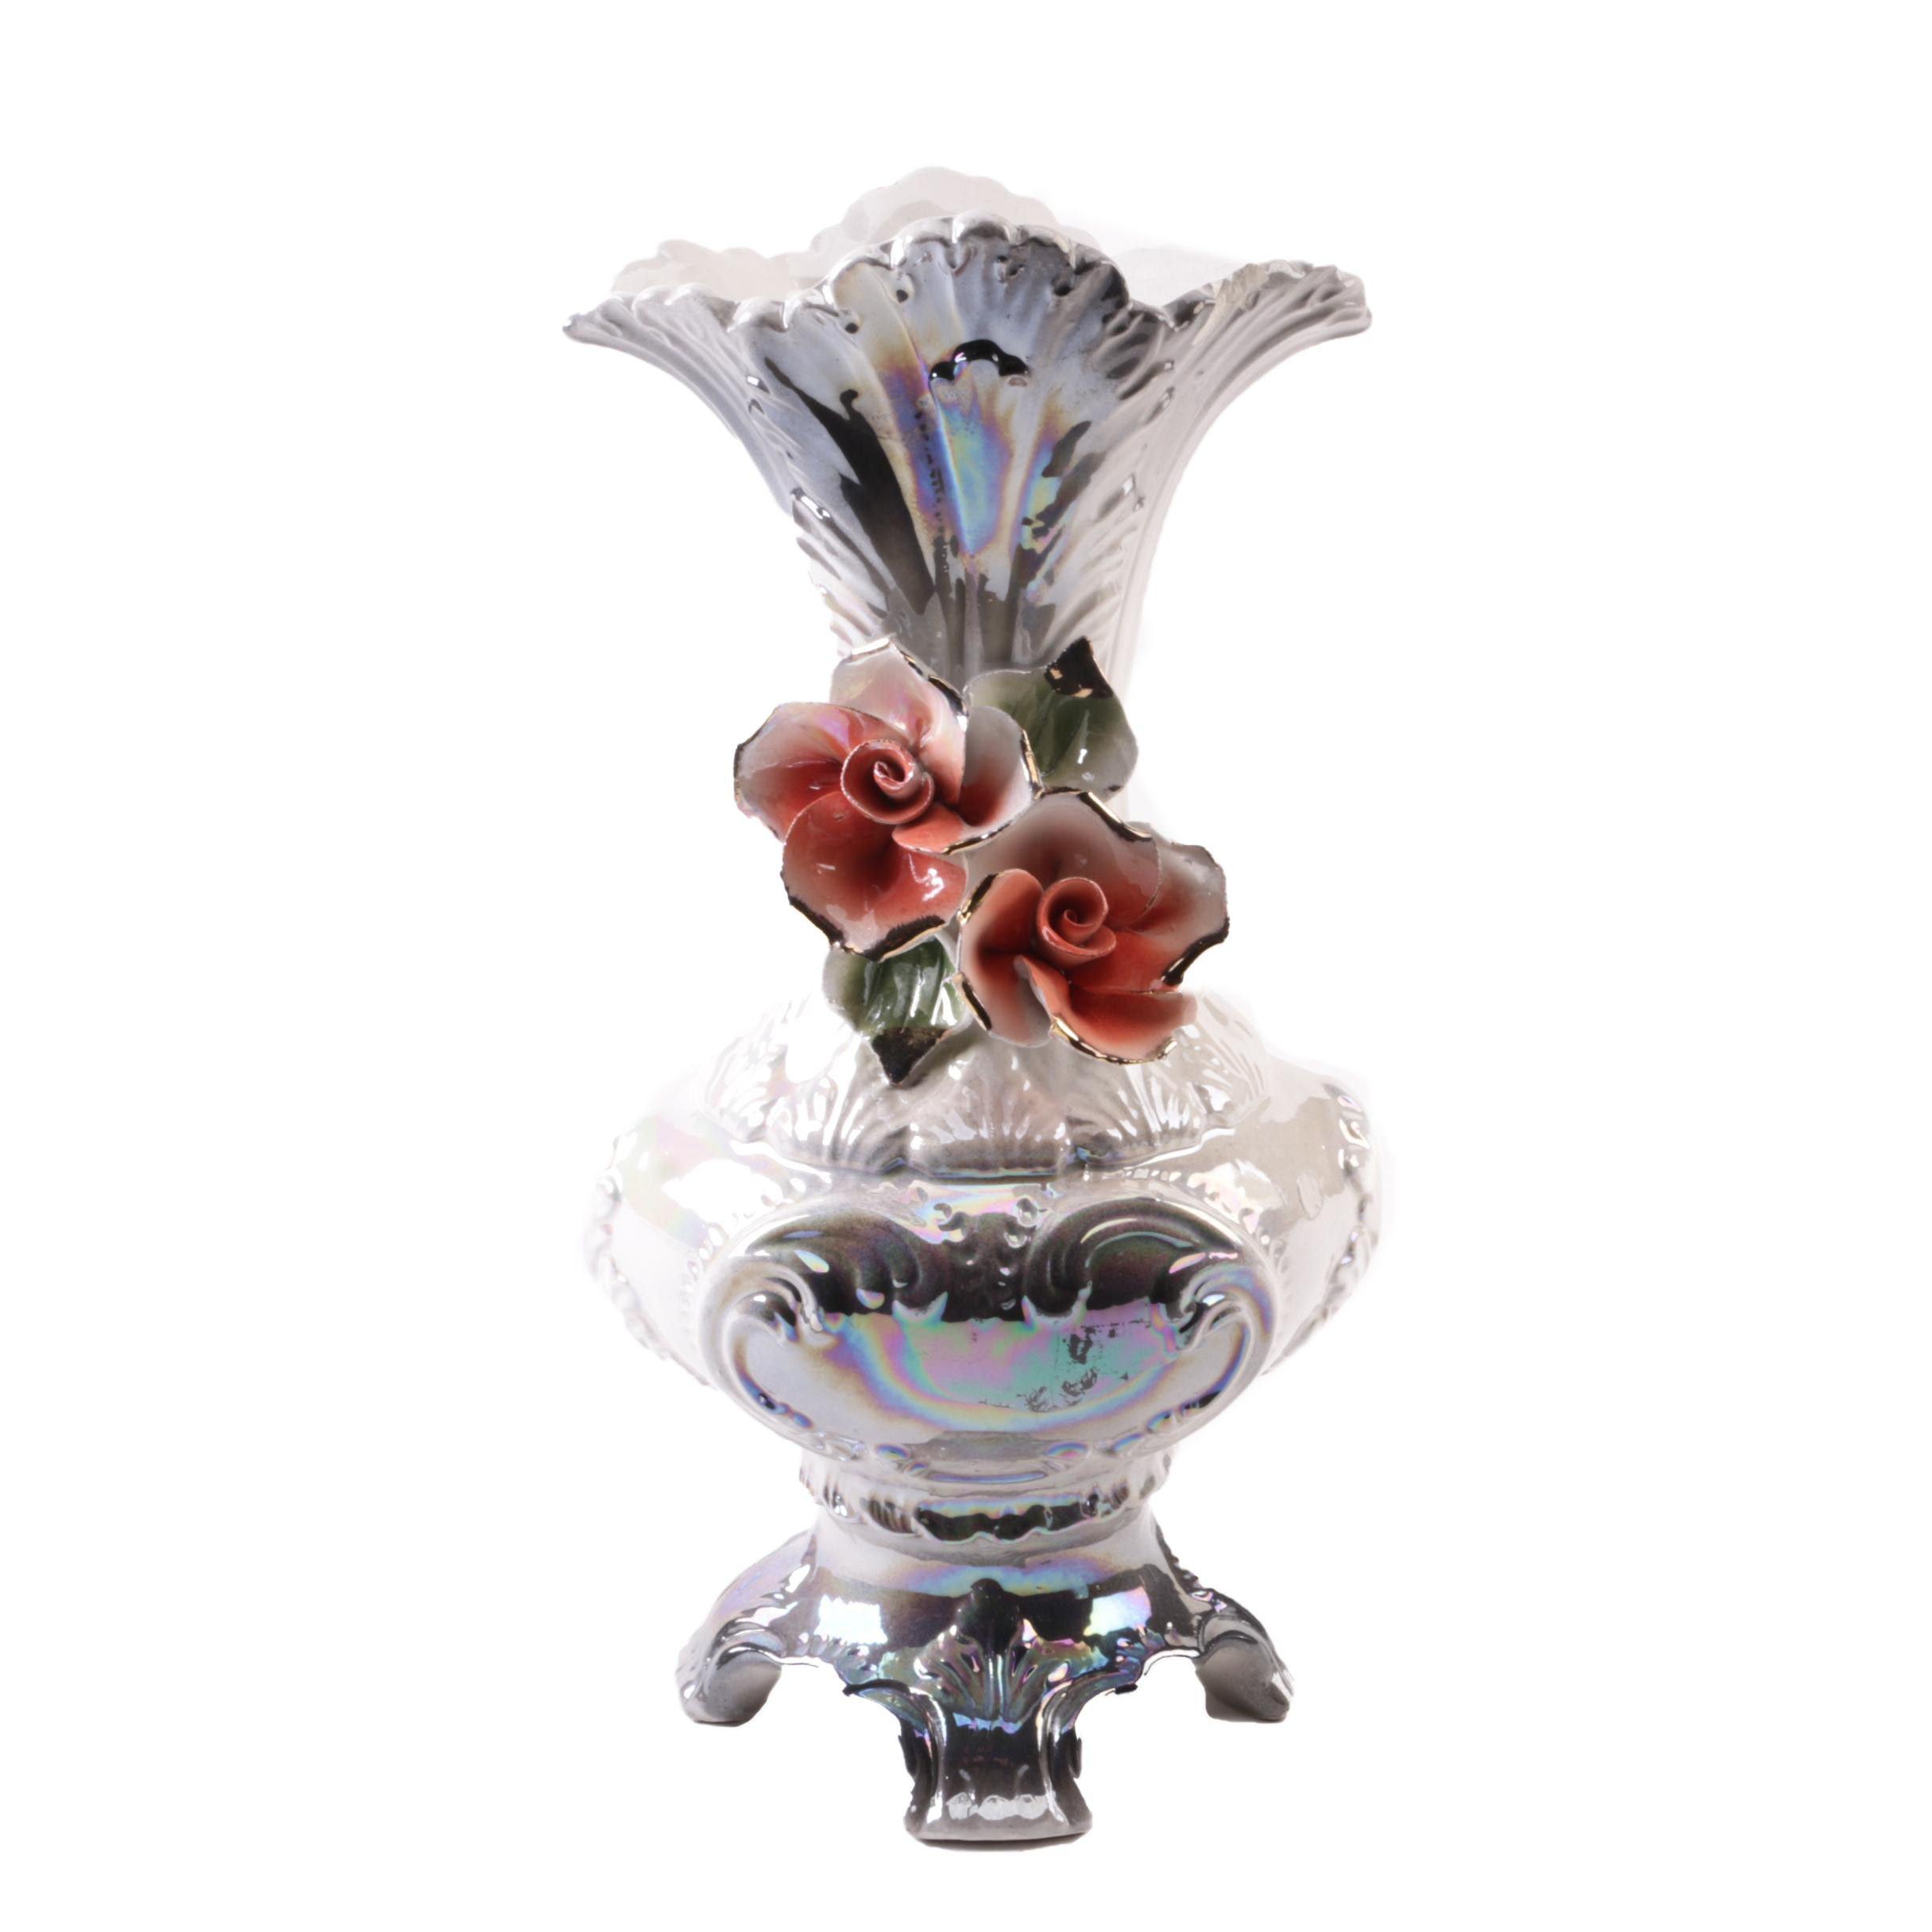 Hand-Painted Capodimonte Style Porcelain Vase